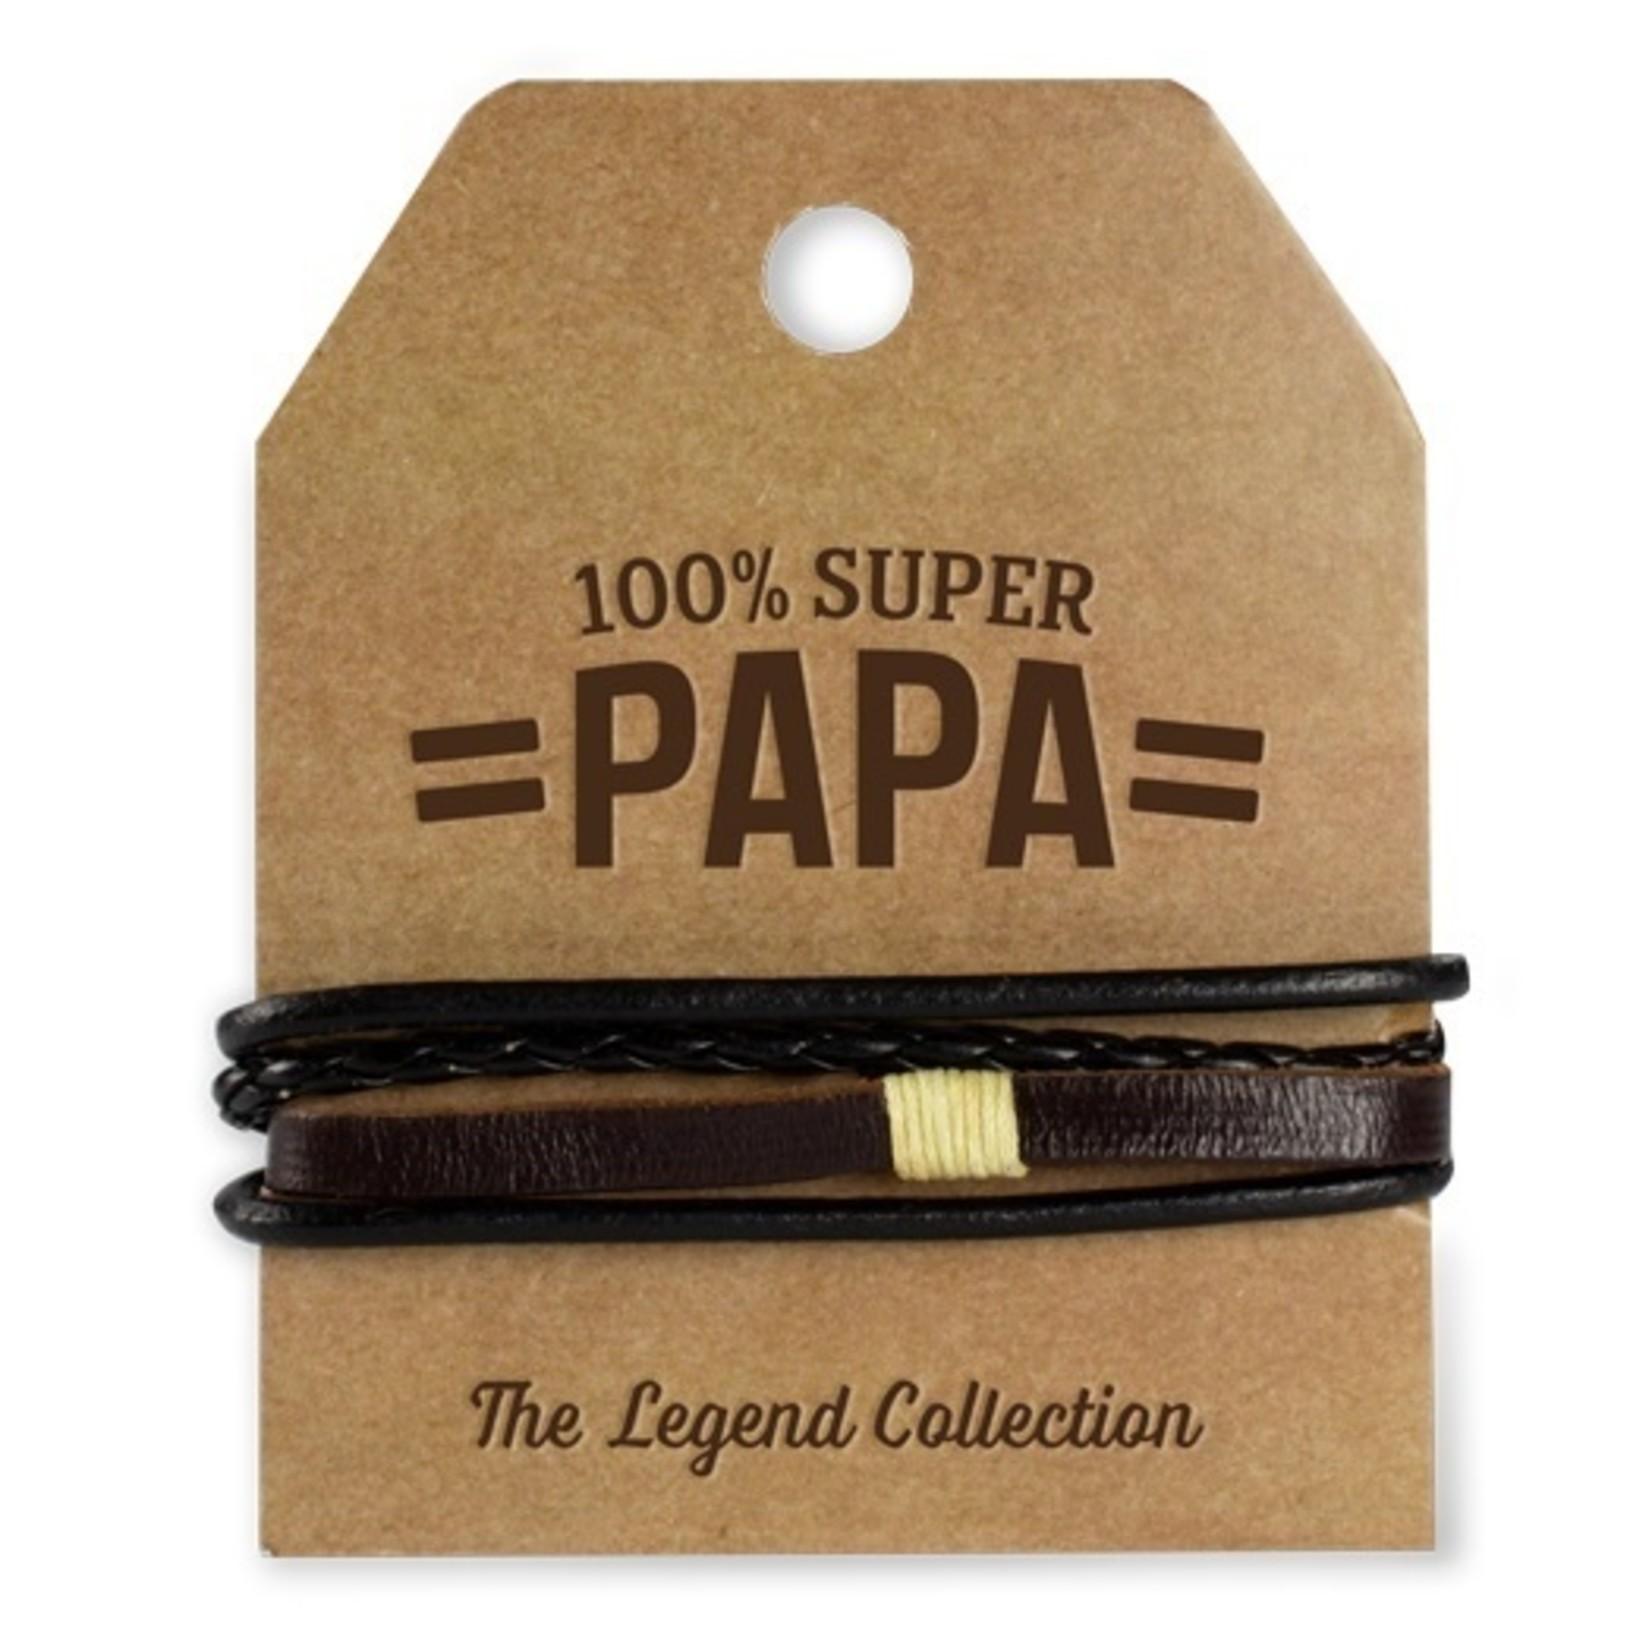 Miko Armband Legend 100% Super papa